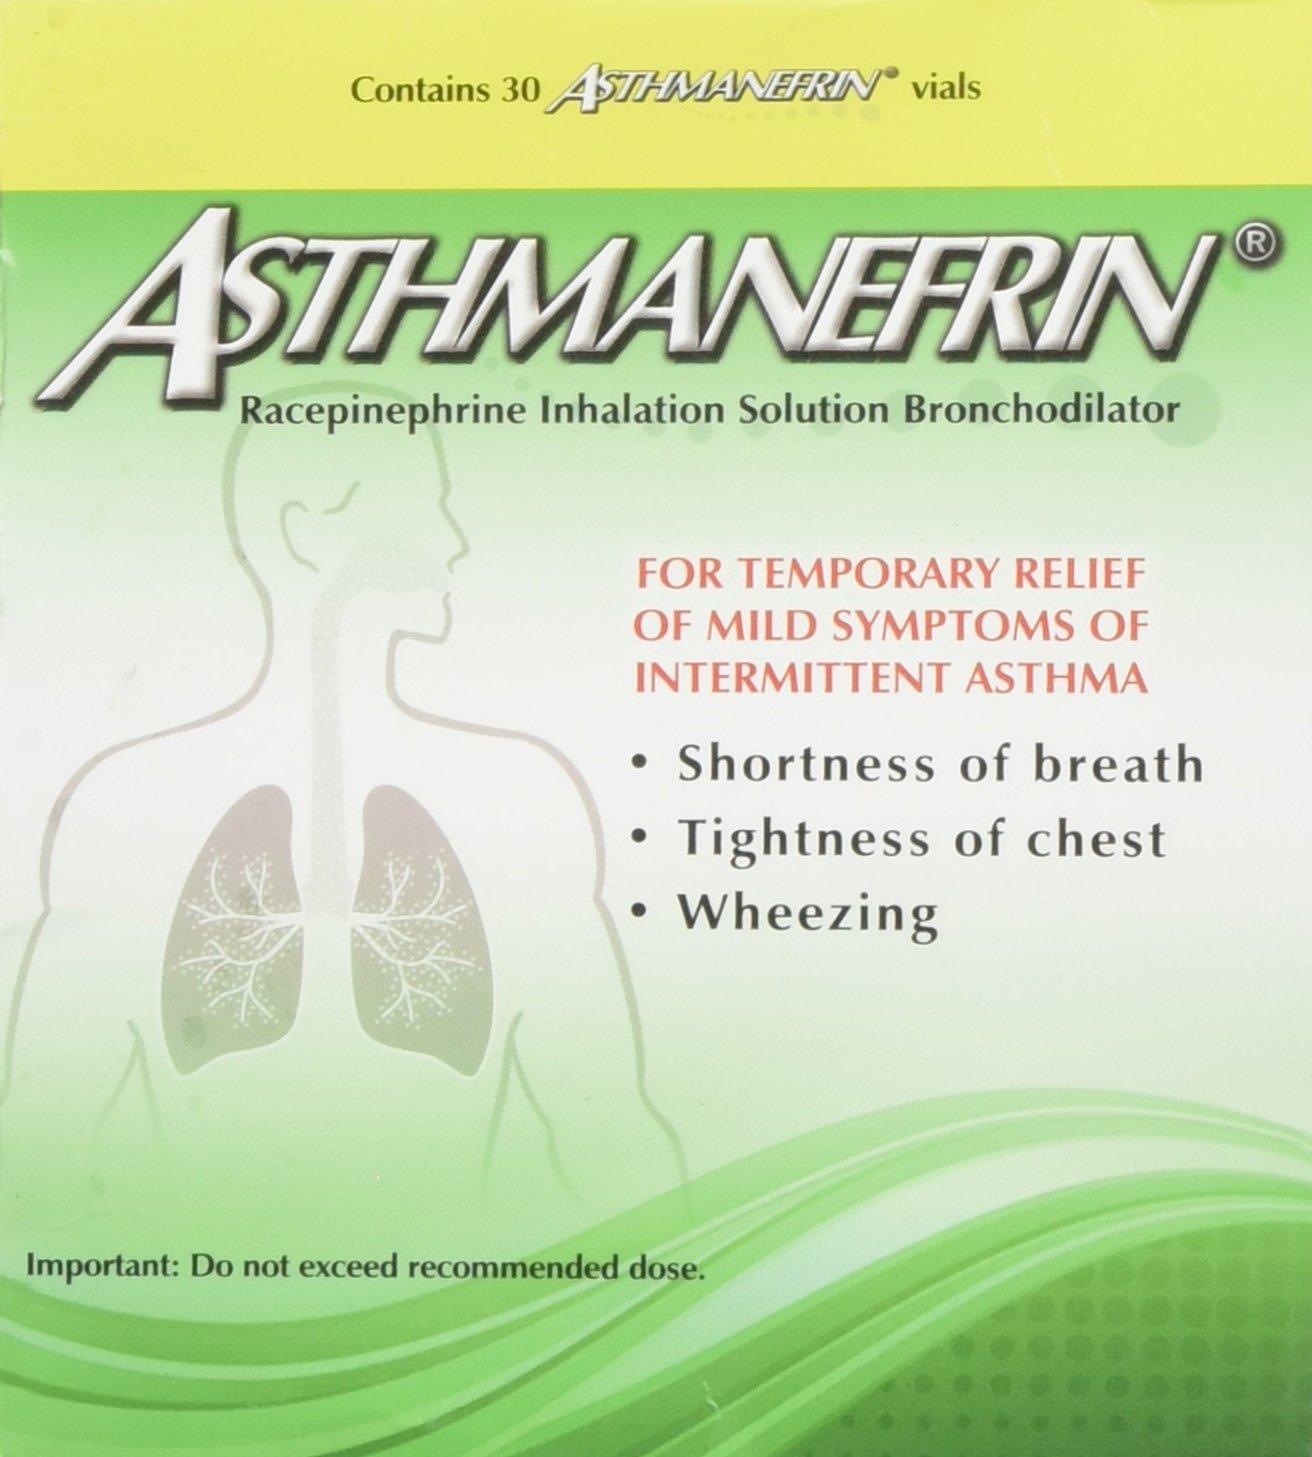 Asthmanefrin Asthma Medication Refill, 30 Count